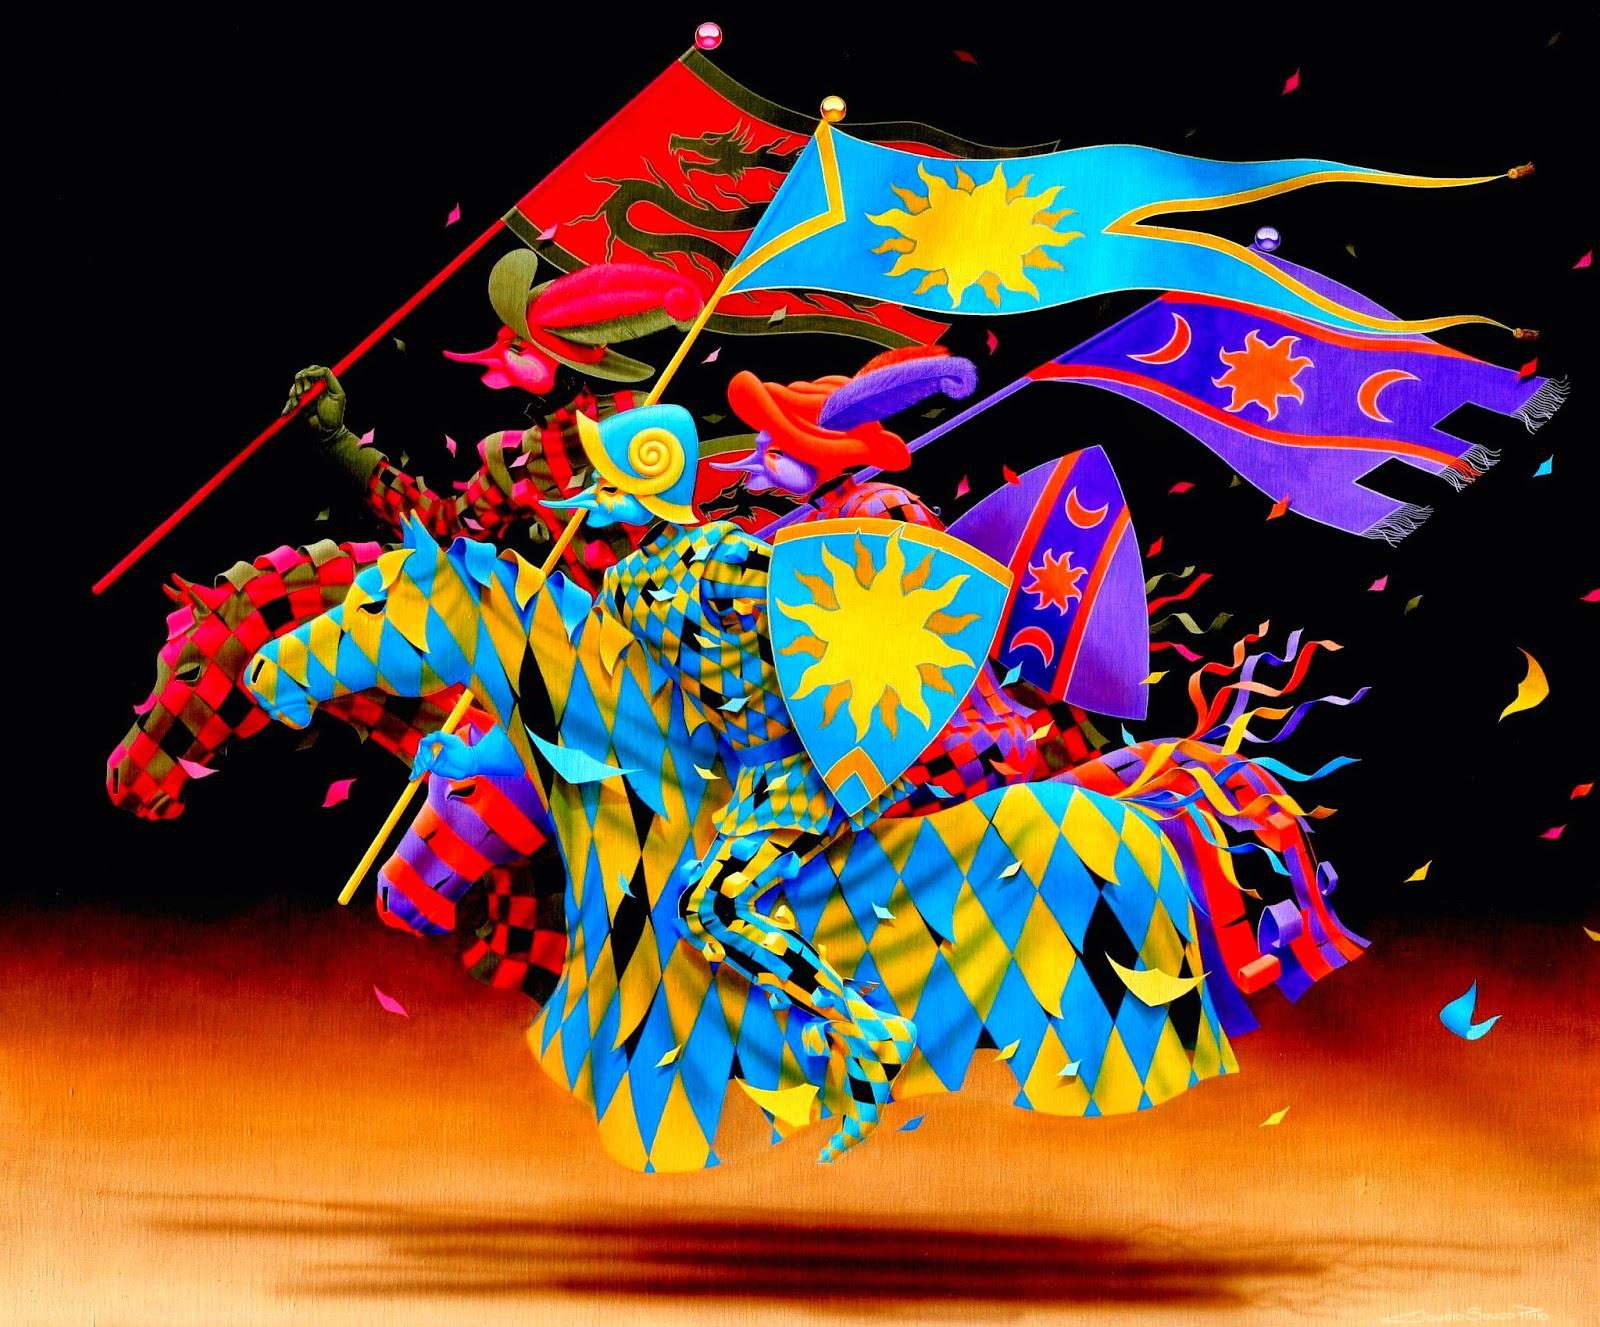 Cavalaria de Siena - Claudio Souza Pinto e suas pinturas cheias de cor e criatividade